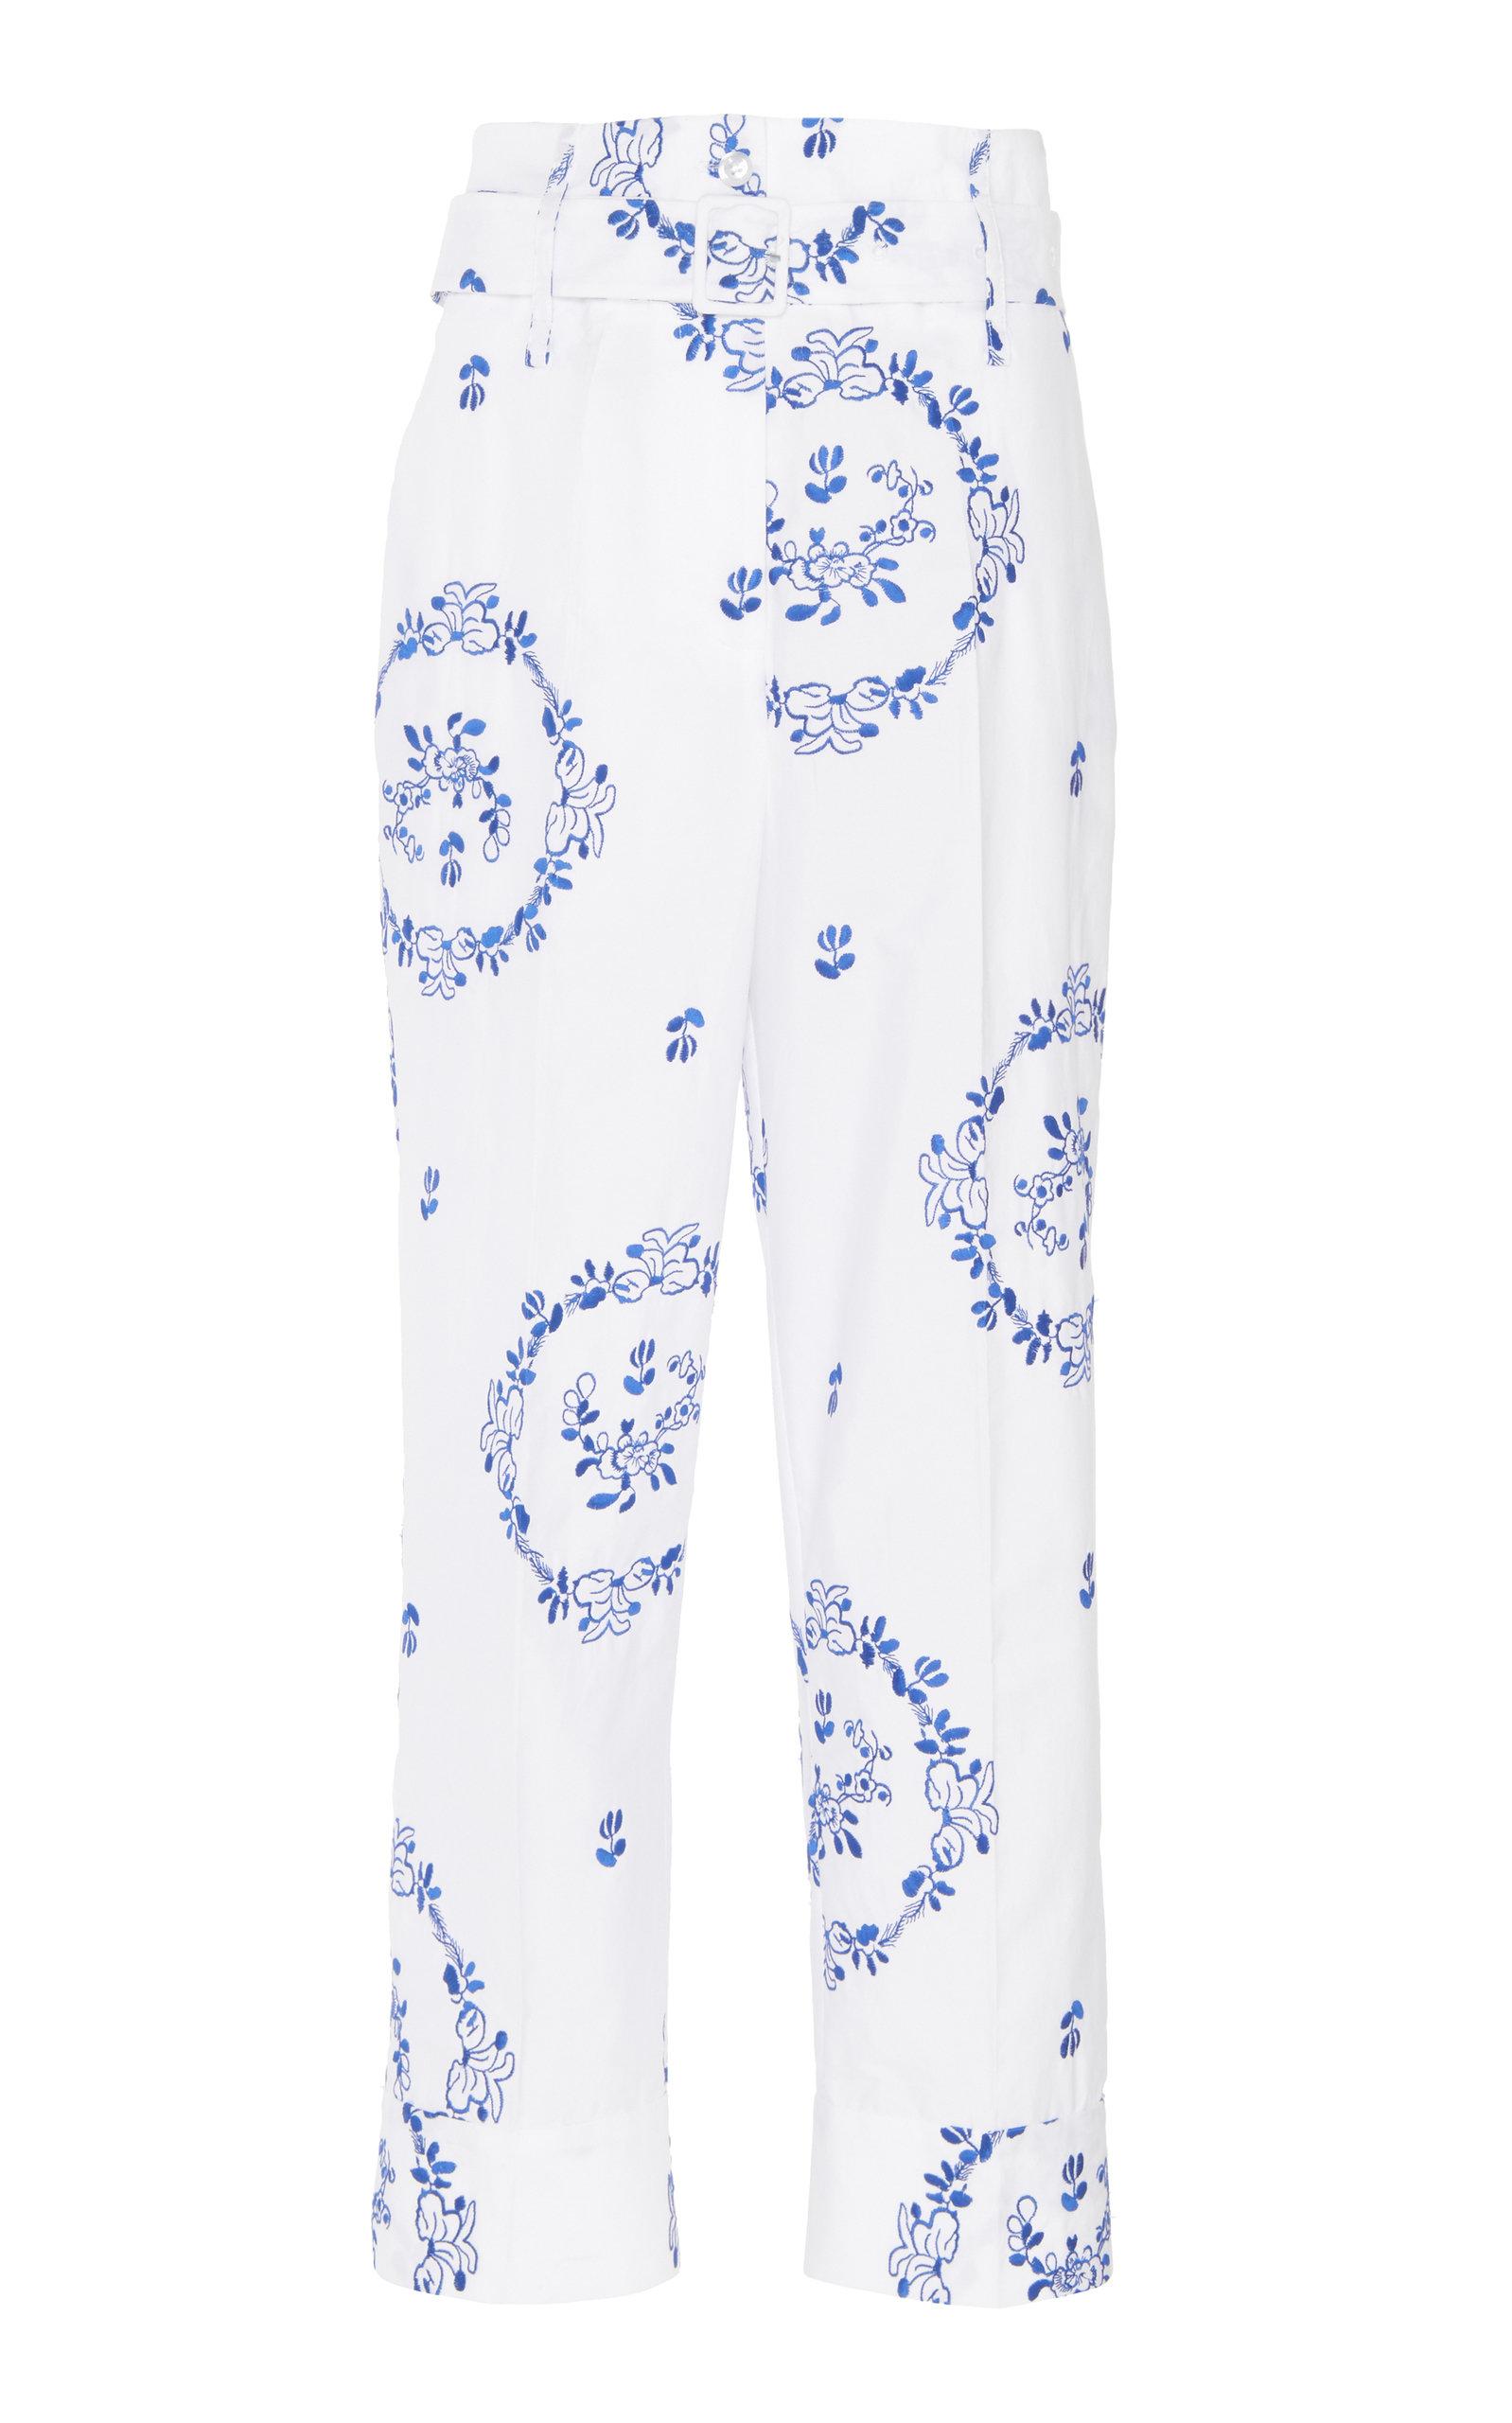 Simone Rocha Pants PRINTED HIGH-RISE STRETCH-COTTON PANTS